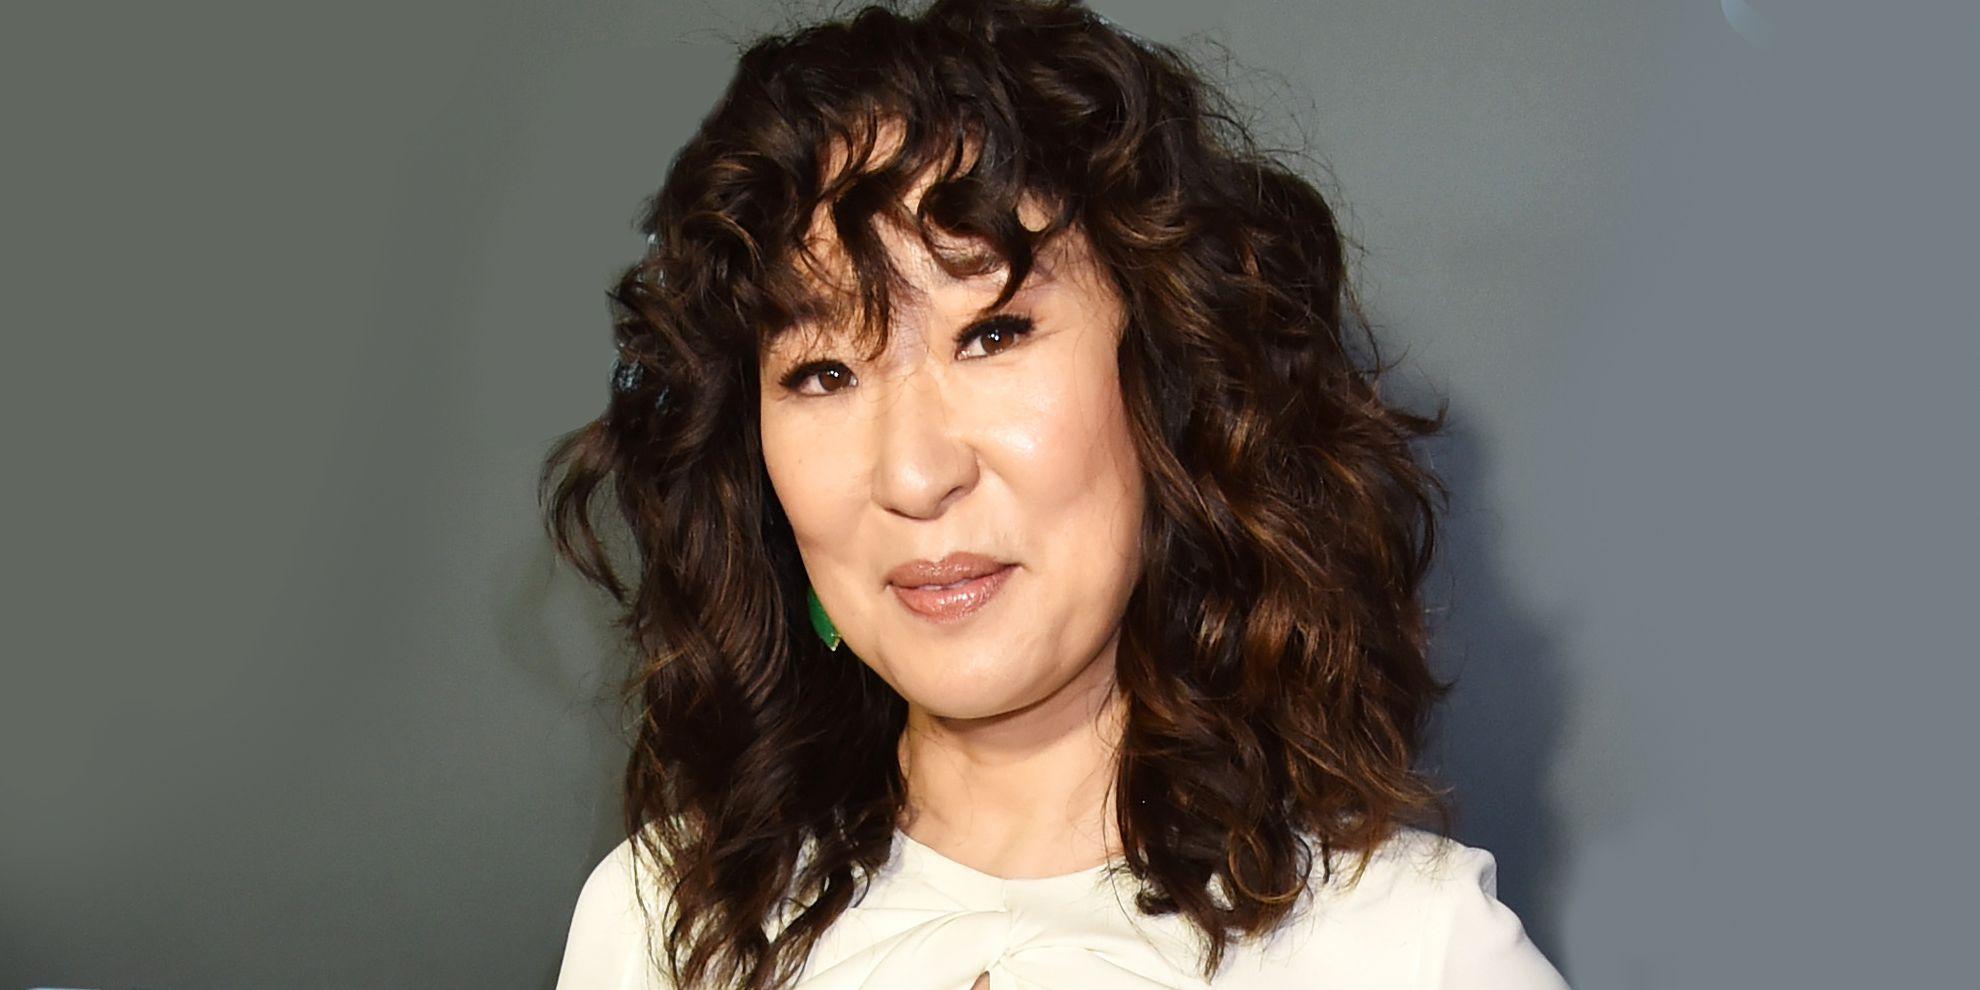 1b4e6b71e99631 Sandra Oh's Curly Hair Routine - Hair Stylist Ted Gibson's Curly ...